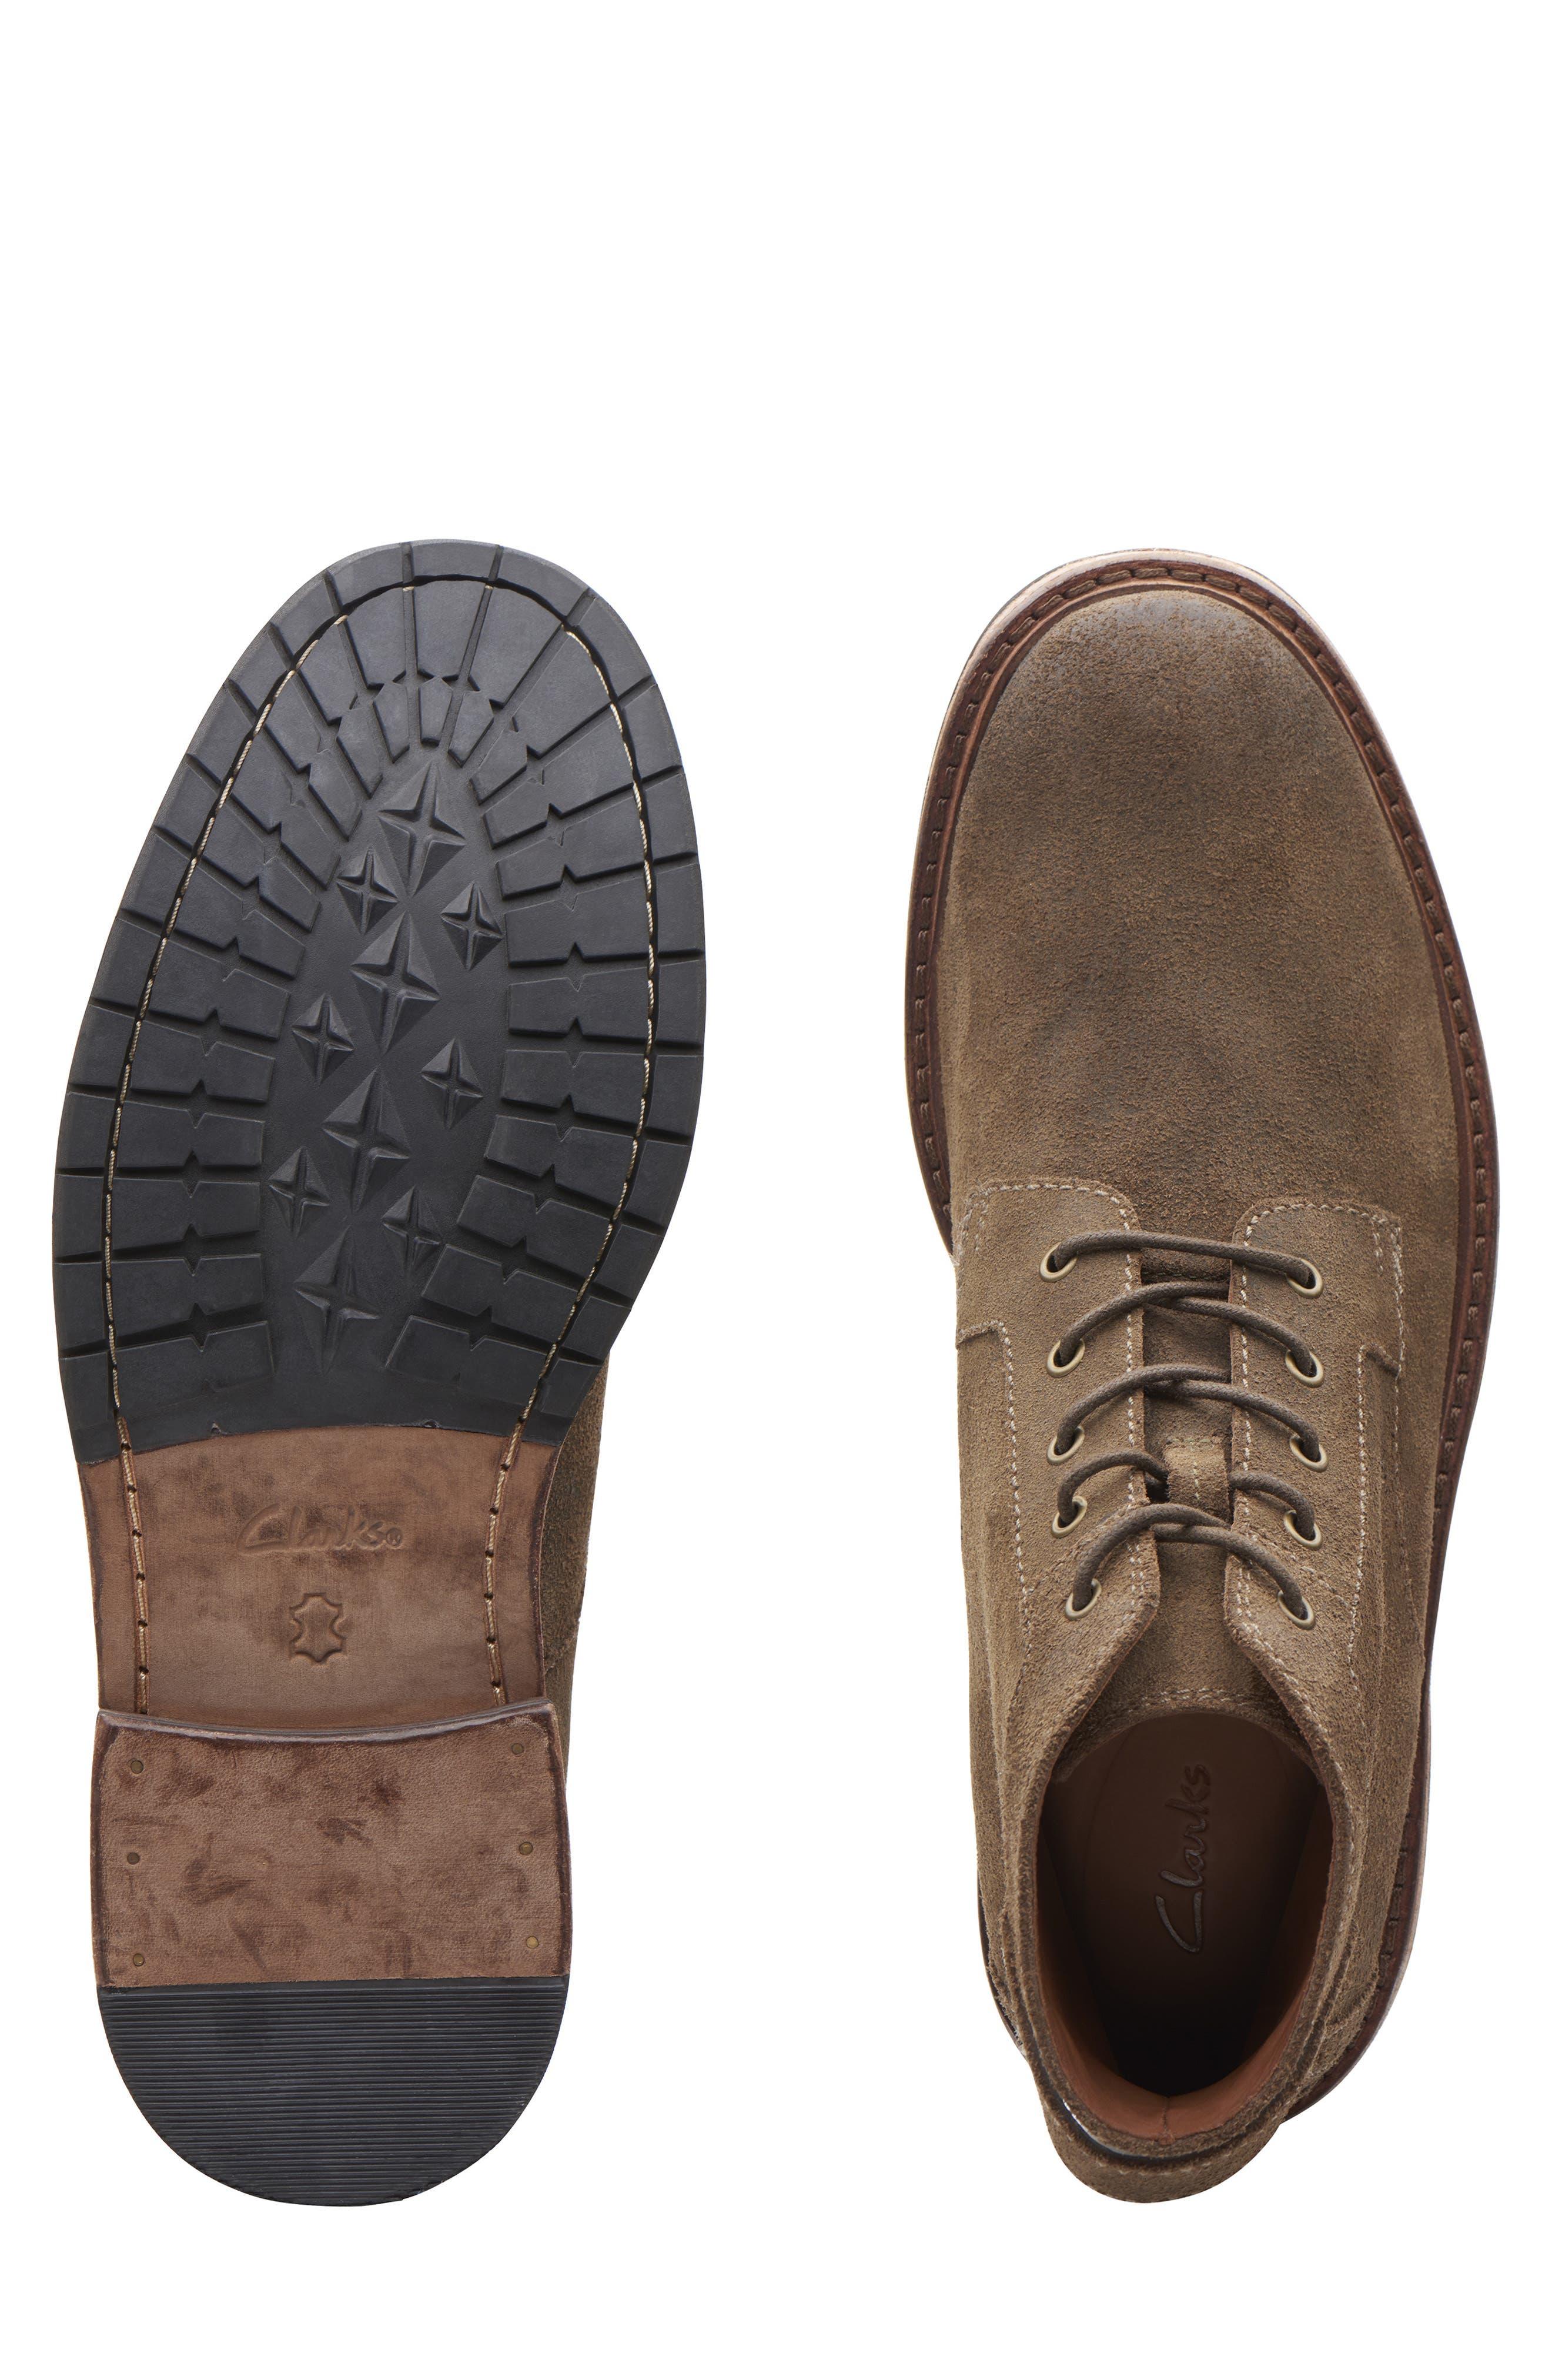 Clarkdale Bud Plain Toe Boot,                             Alternate thumbnail 7, color,                             KHAKI SUEDE